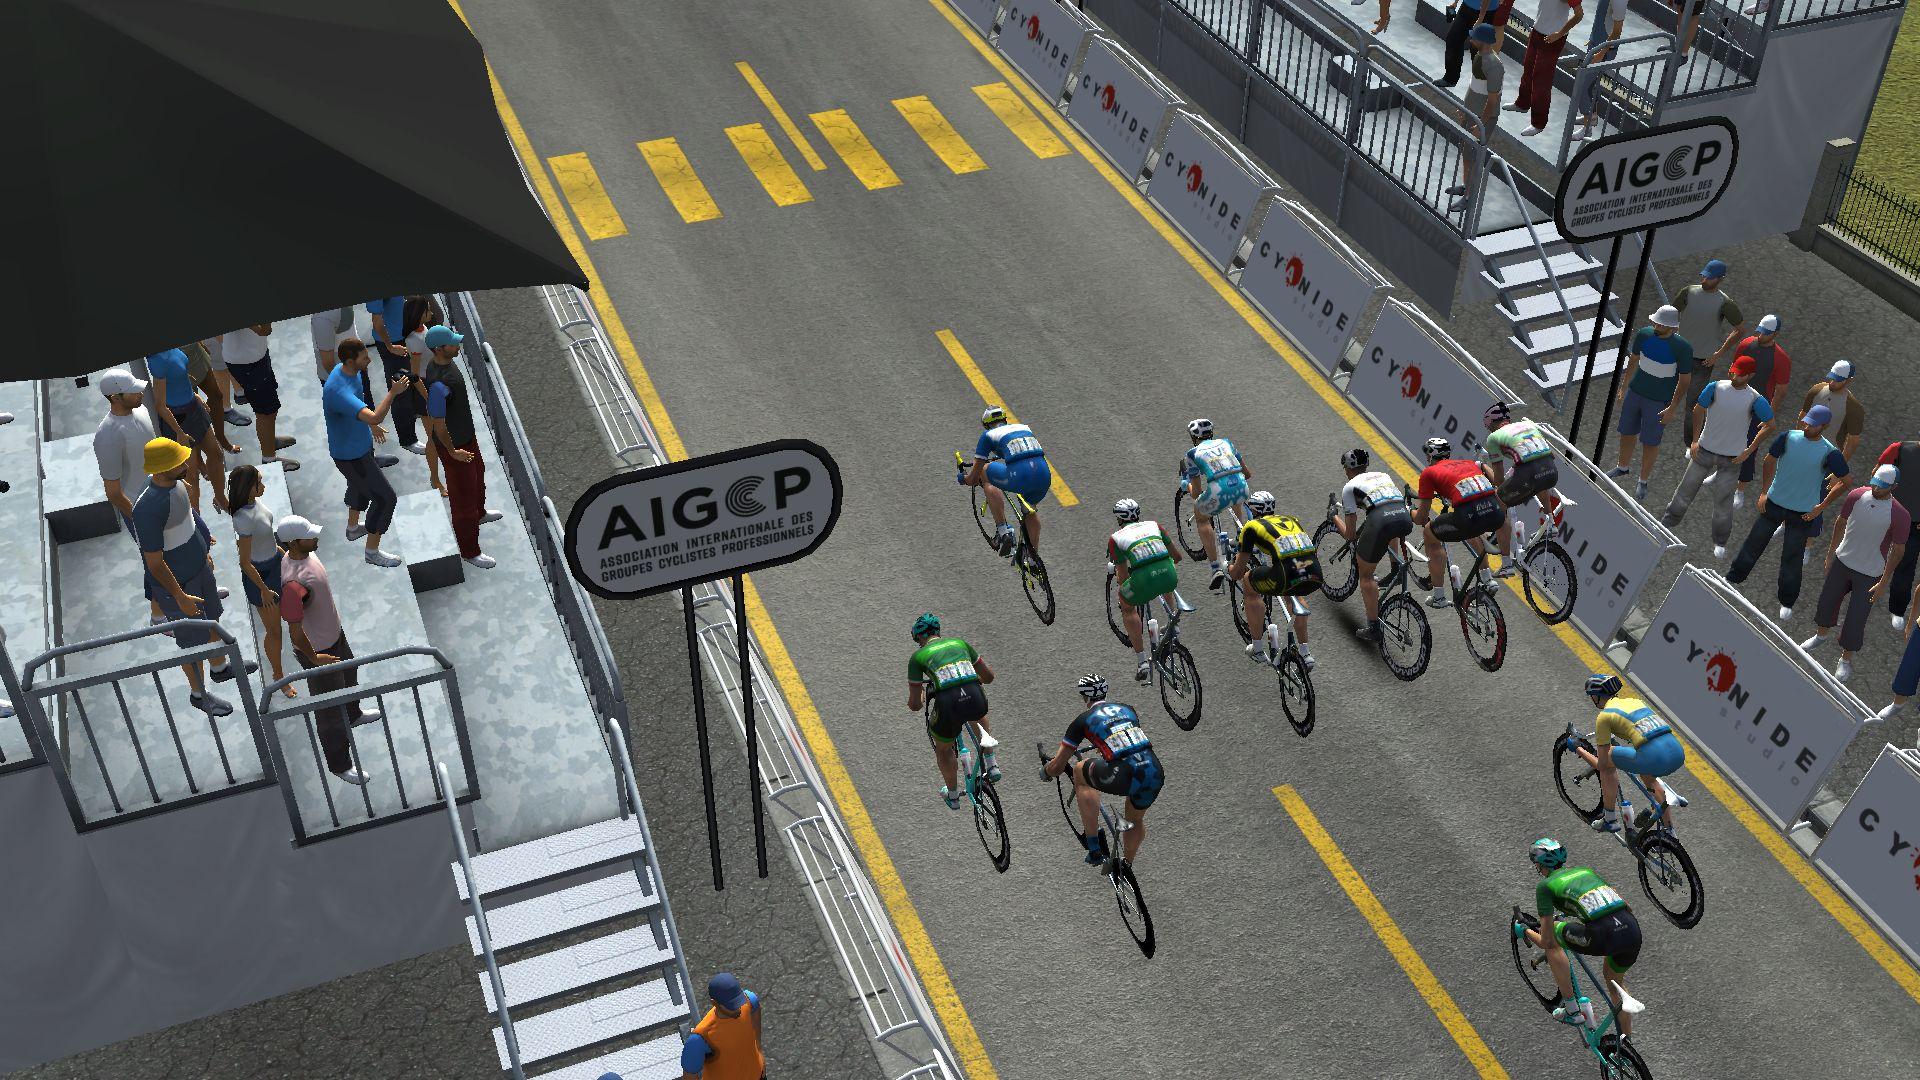 pcmdaily.com/images/mg/2019/Races/C1/TdU/mg19_tdu_02_PCM0046.jpg